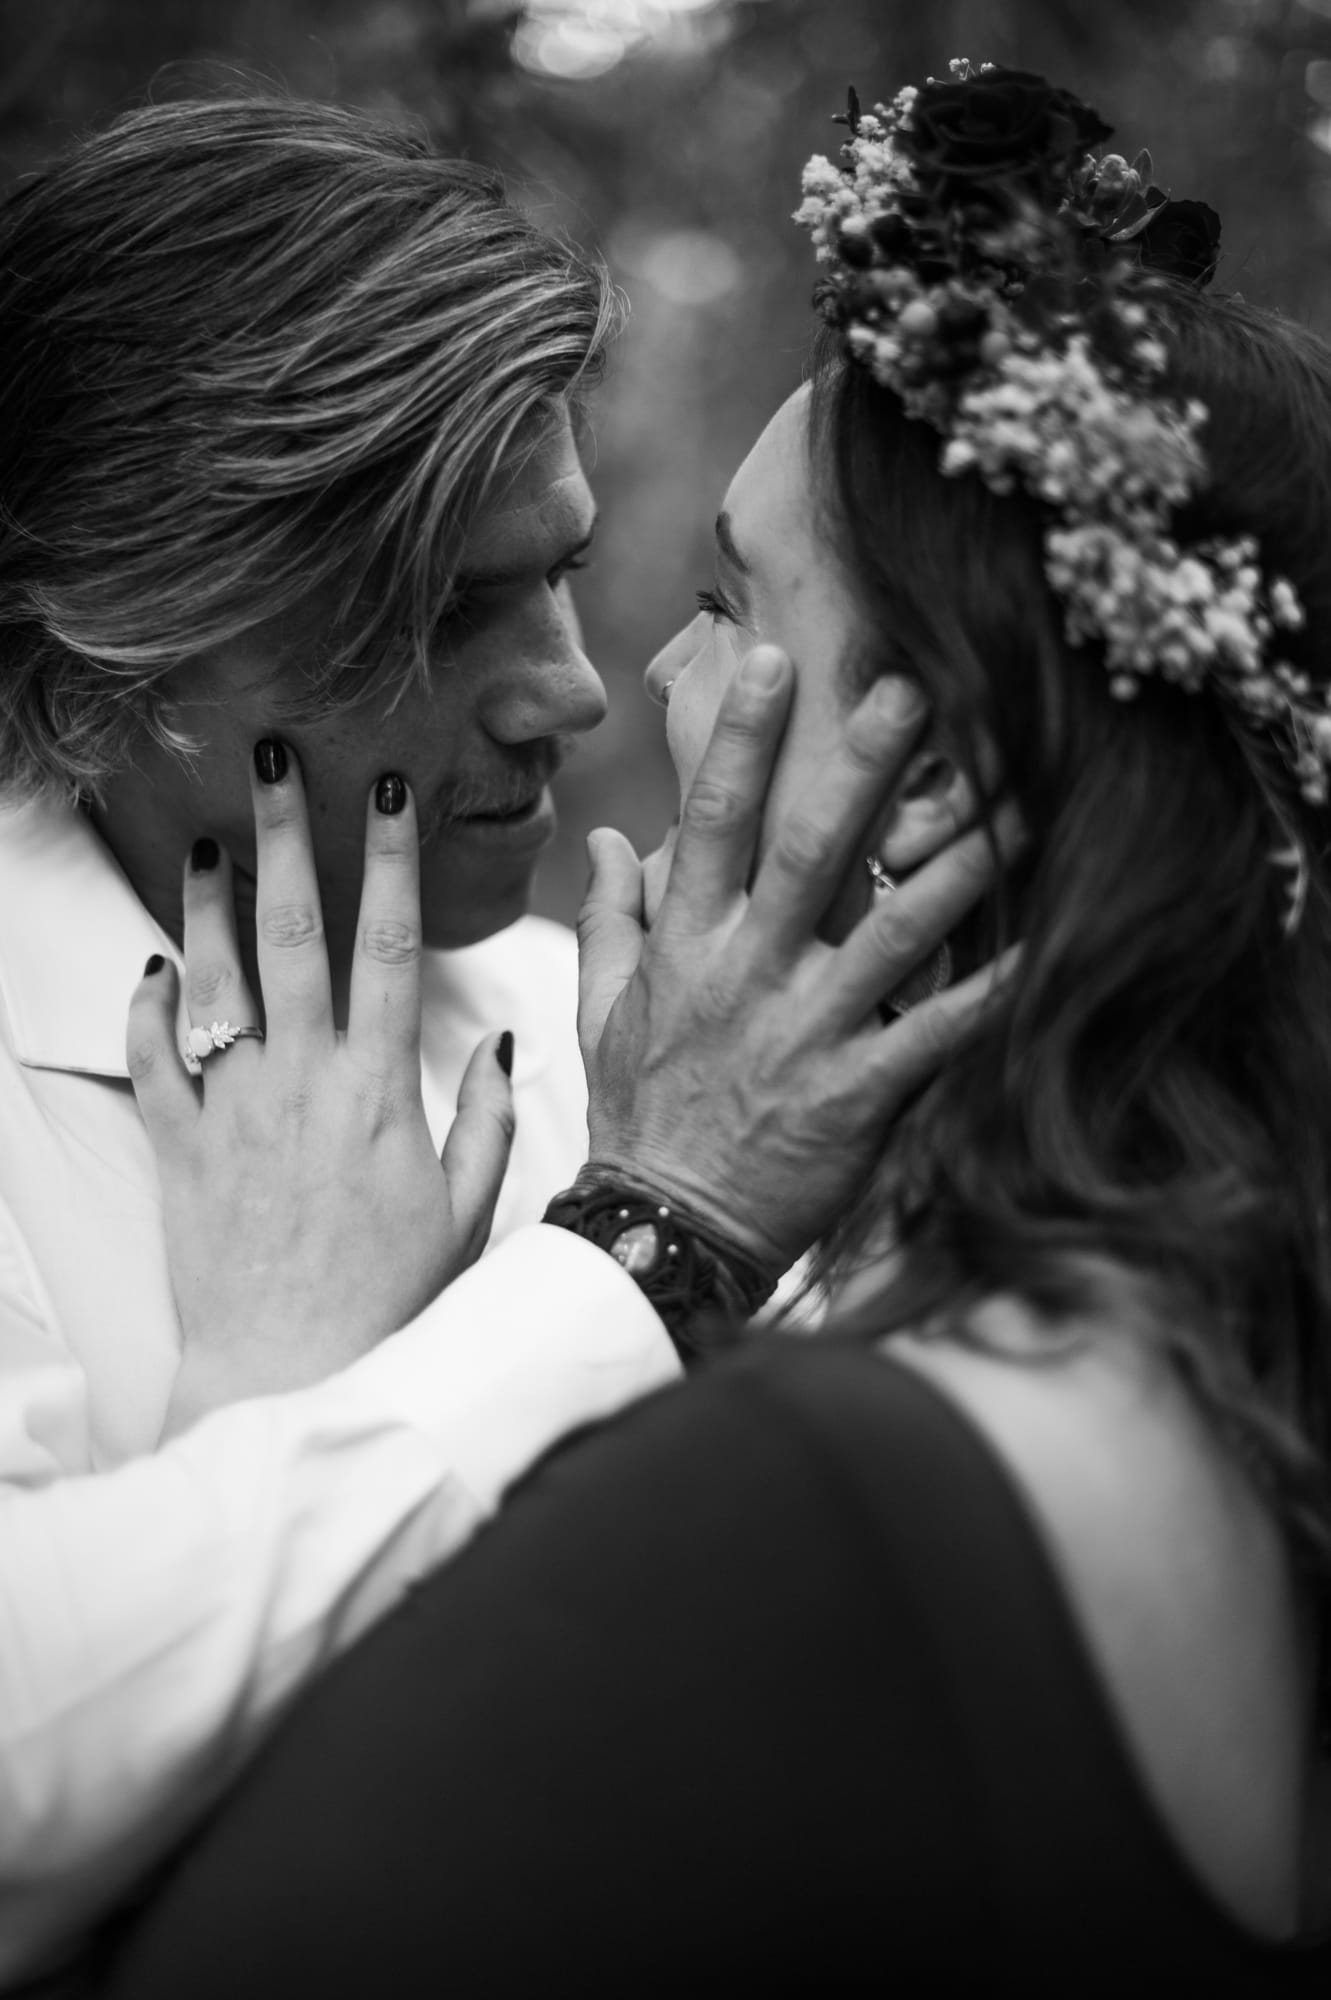 wesley-lanie-george-fernridge-engagement-June-Richards-Photography-Destination-Weddings-Elopements-Garden-Route-39